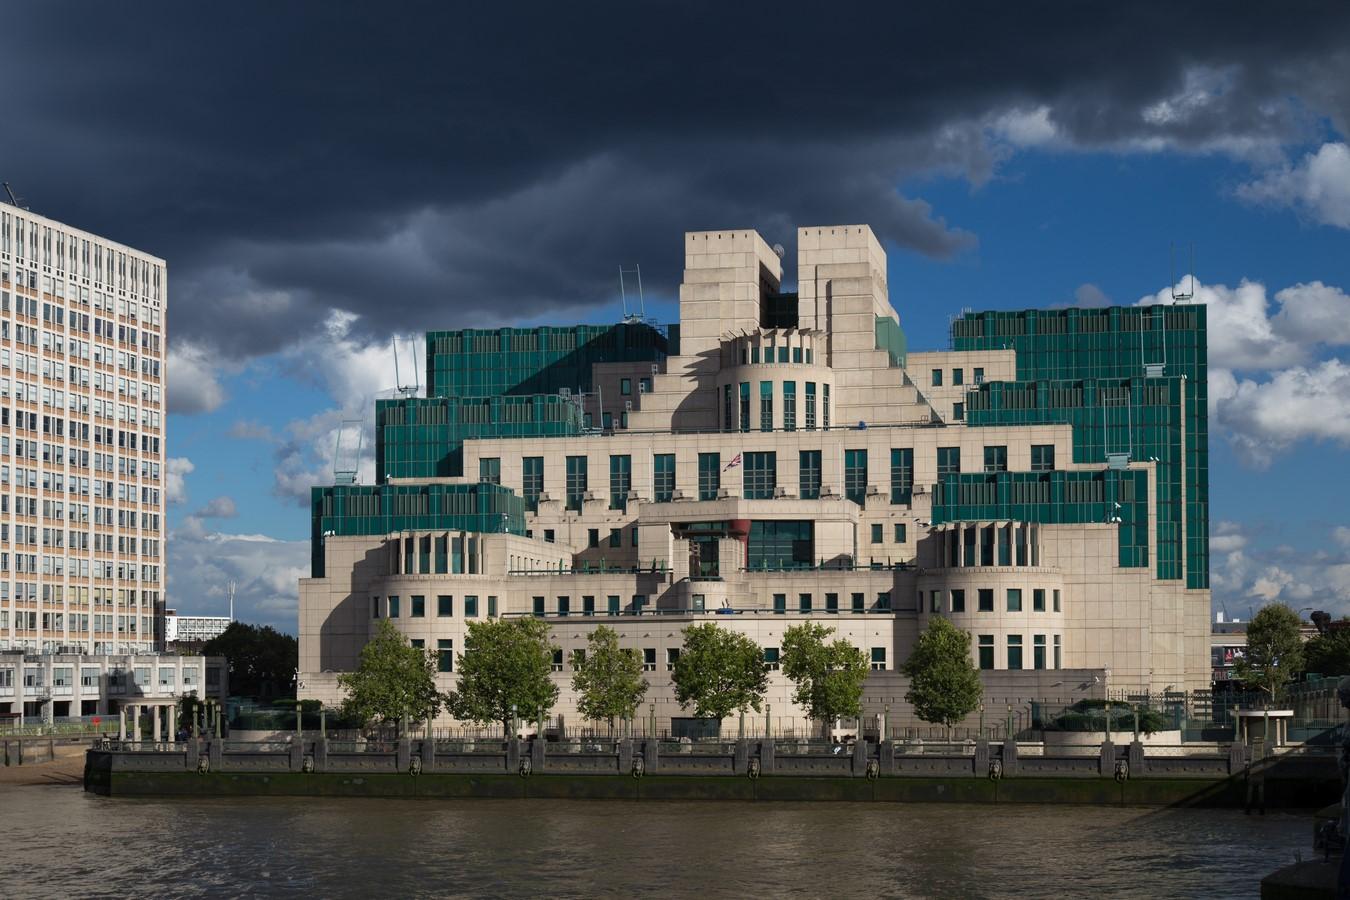 MI6 building, London, UK - SHeet1